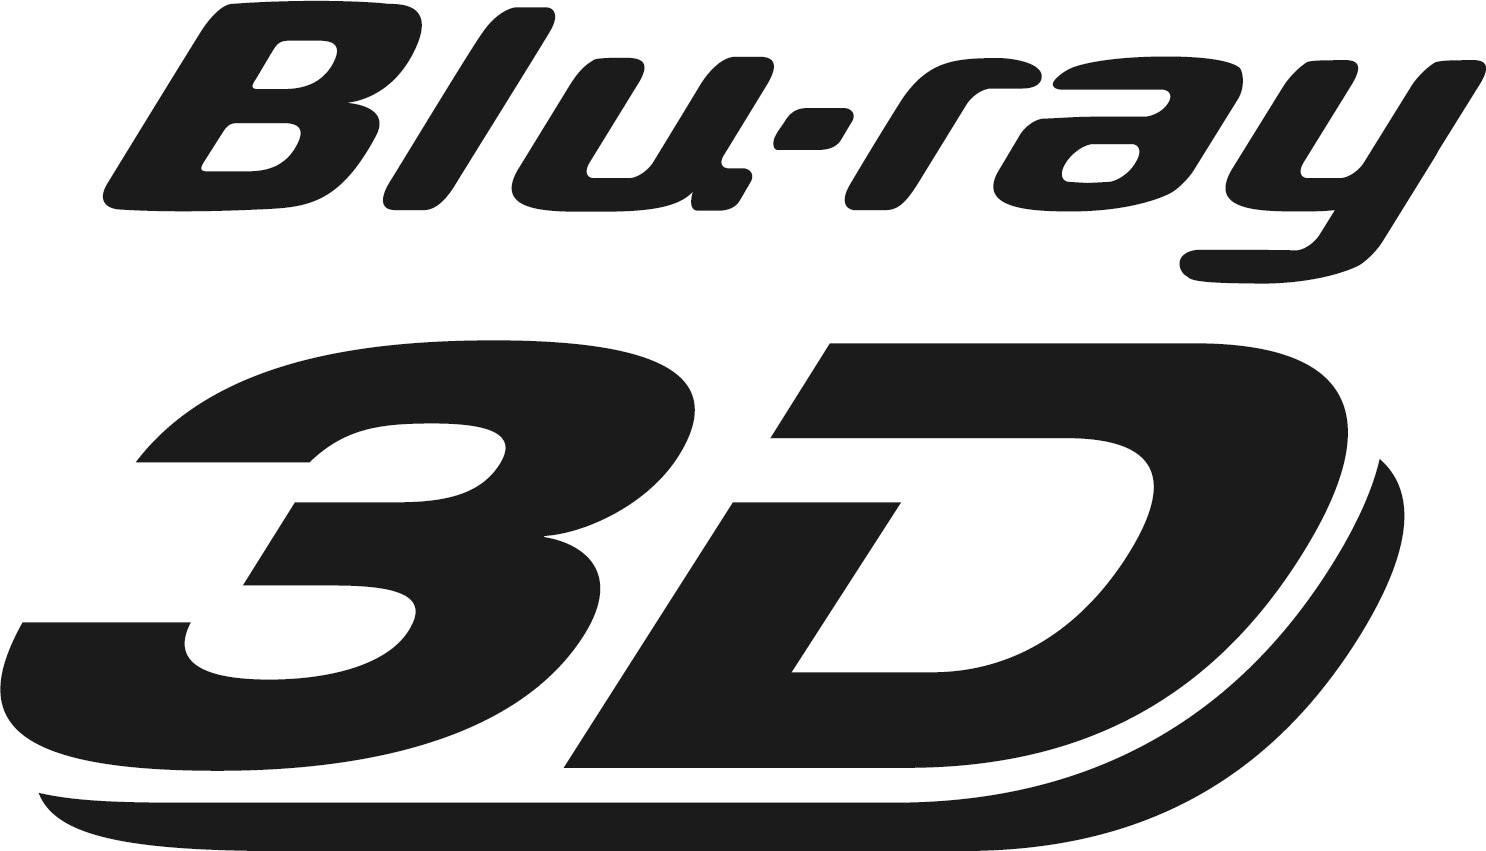 SONY BLU-RAY PLAYER - 3Dbluray